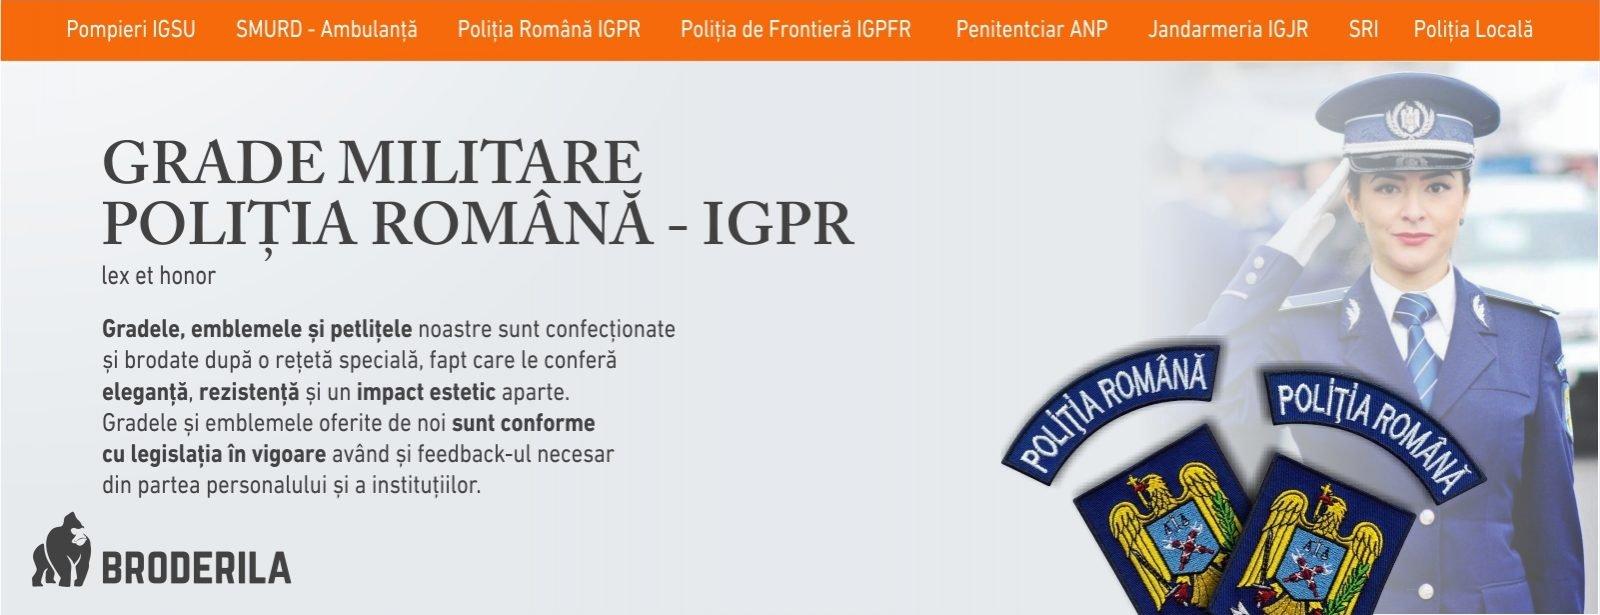 grade militare politie igpr grade militare politia romana emblema politia romana brodata broderila.ro